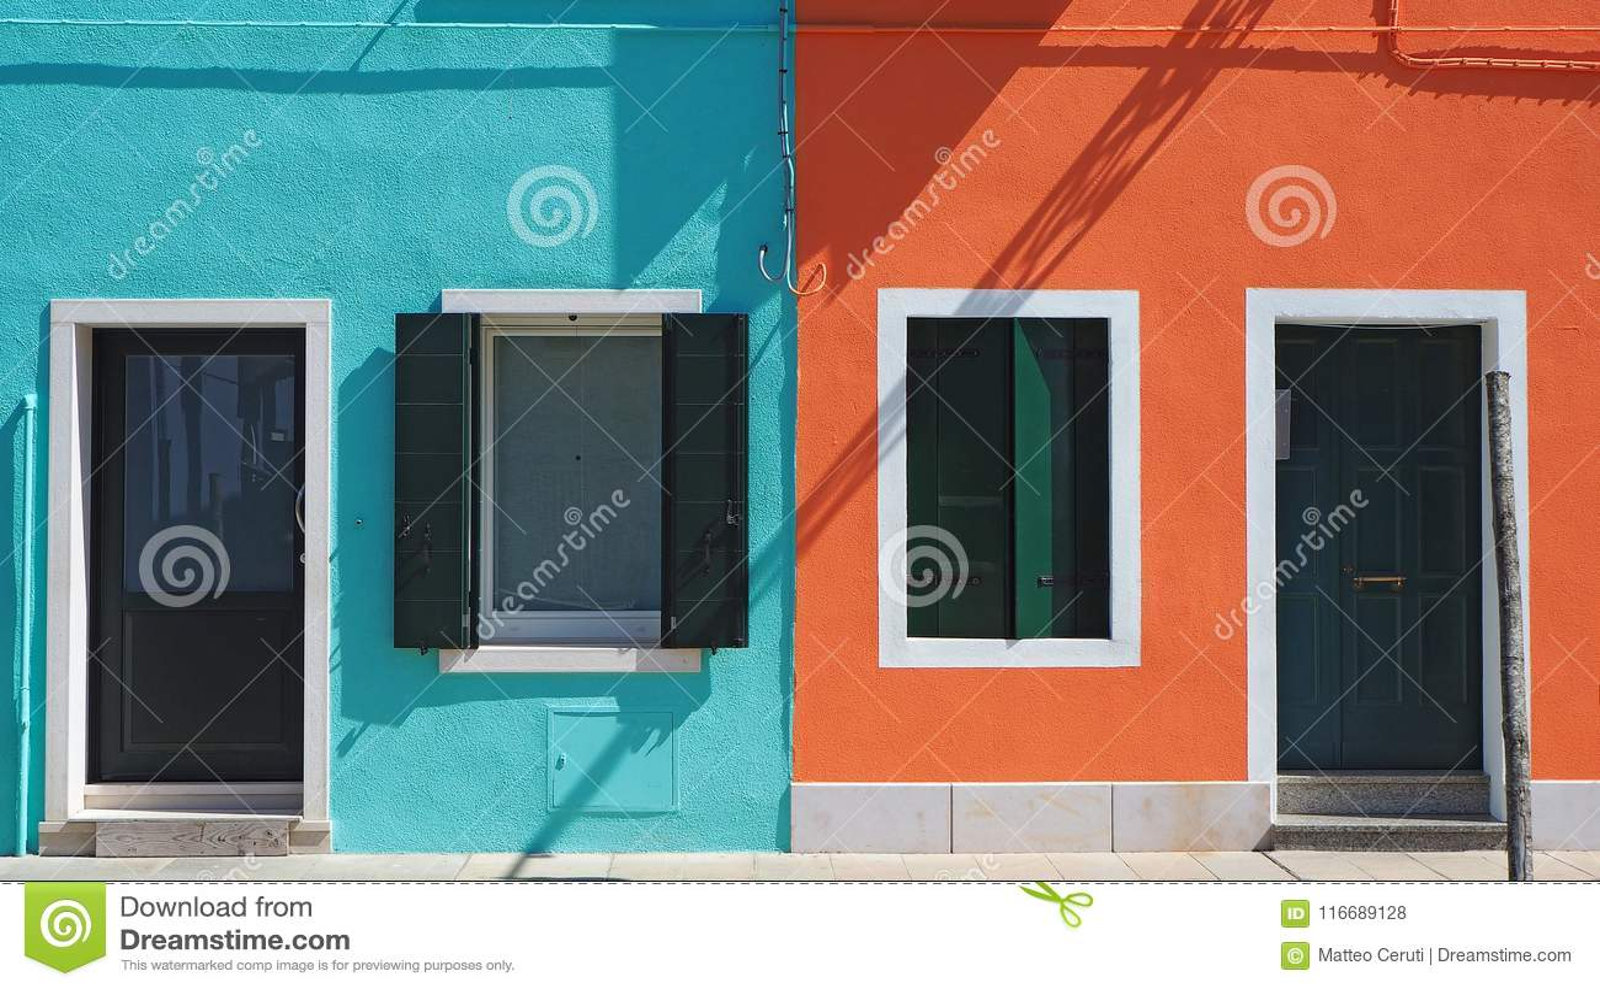 Burano, Venezia, Ιταλία Λεπτομέρειες των παραθύρων και των πορτών των ζωηρόχρωμων σπιτιών στο νησί Burano